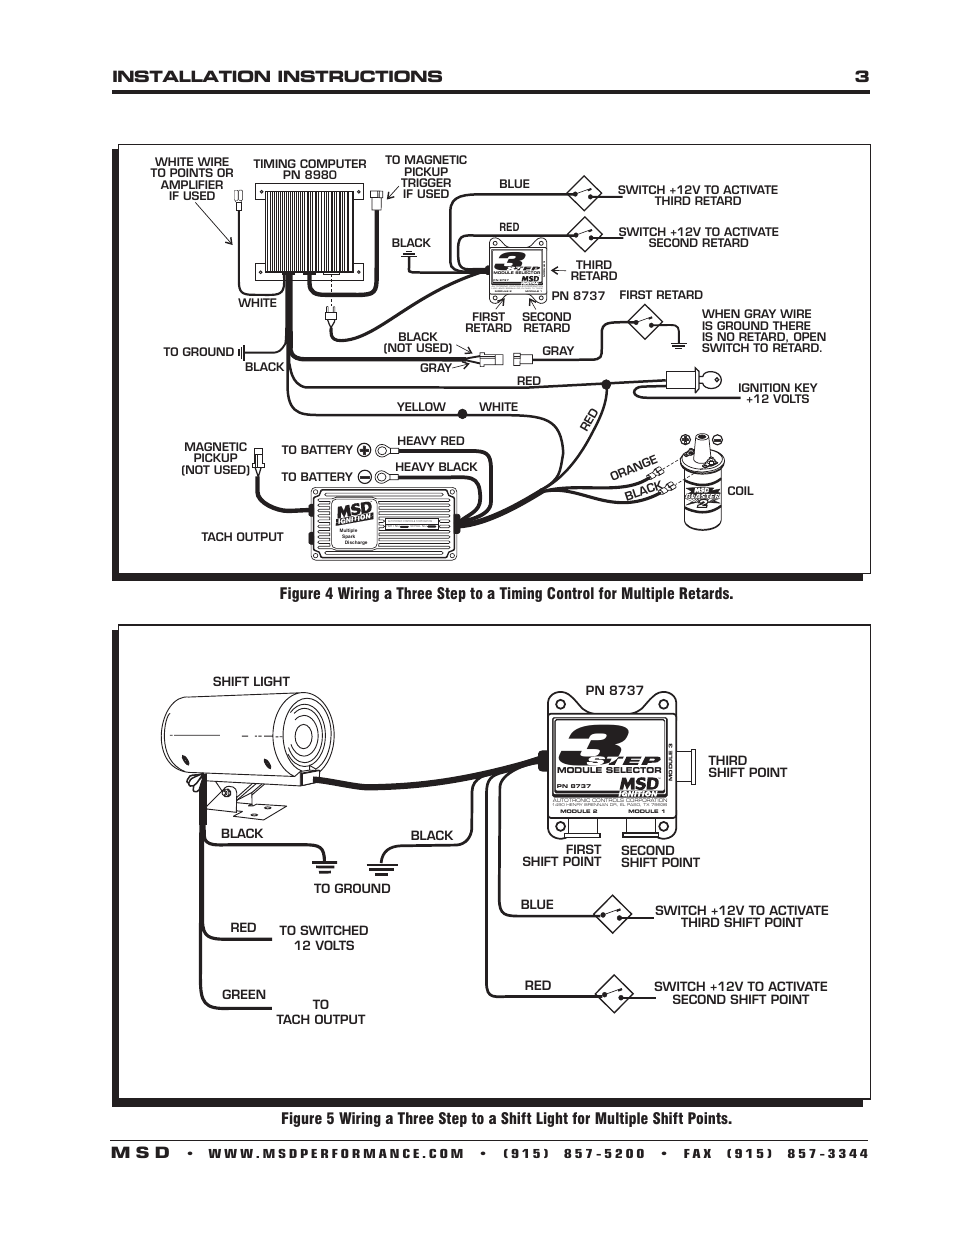 msd wiring diagram msd ignition wiring diagram two step wiring diagram data msd wiring diagrams and technotes msd ignition wiring diagram two step